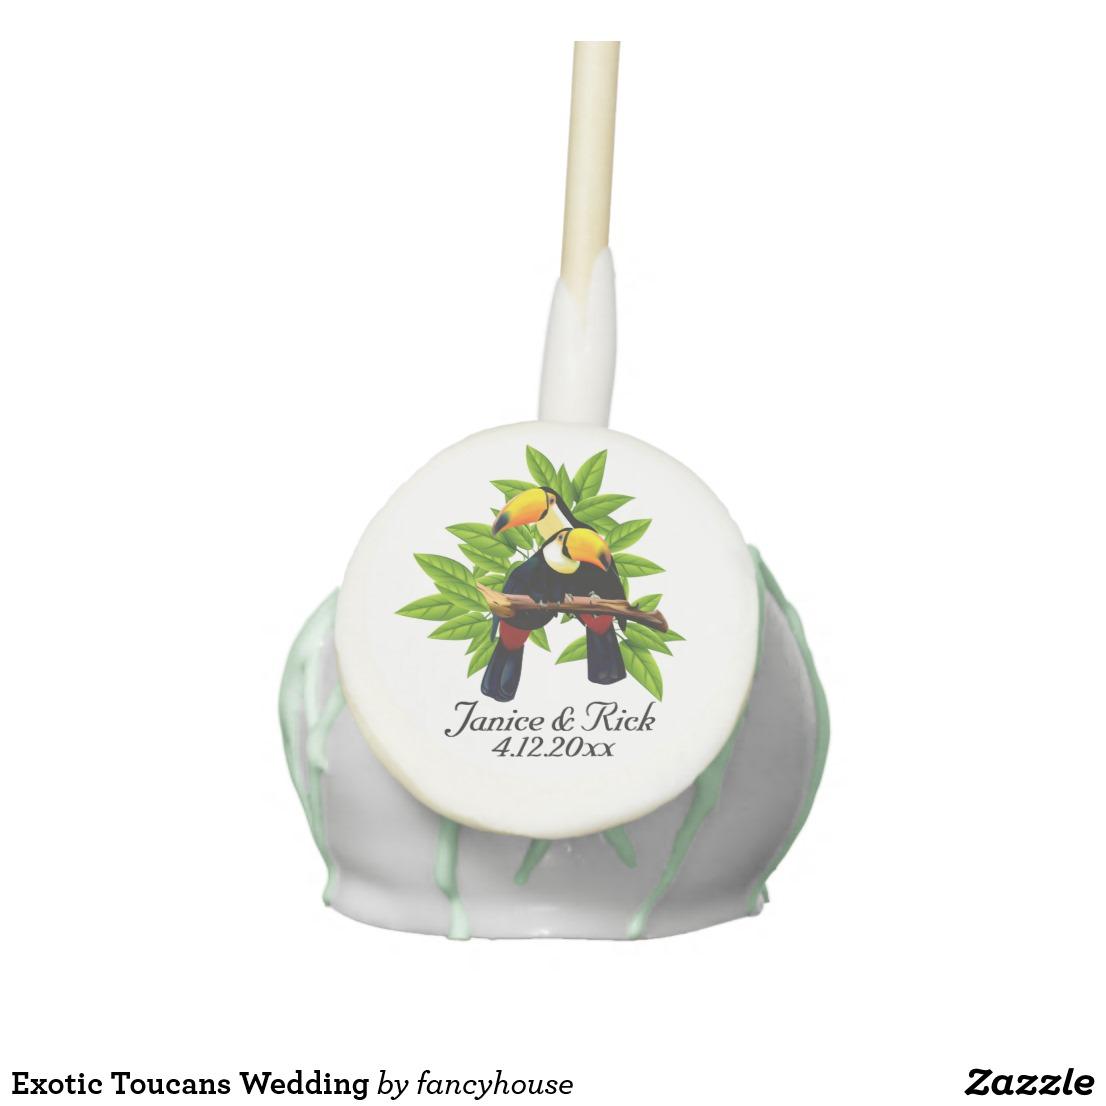 Exotic Toucans Wedding Cake Pops